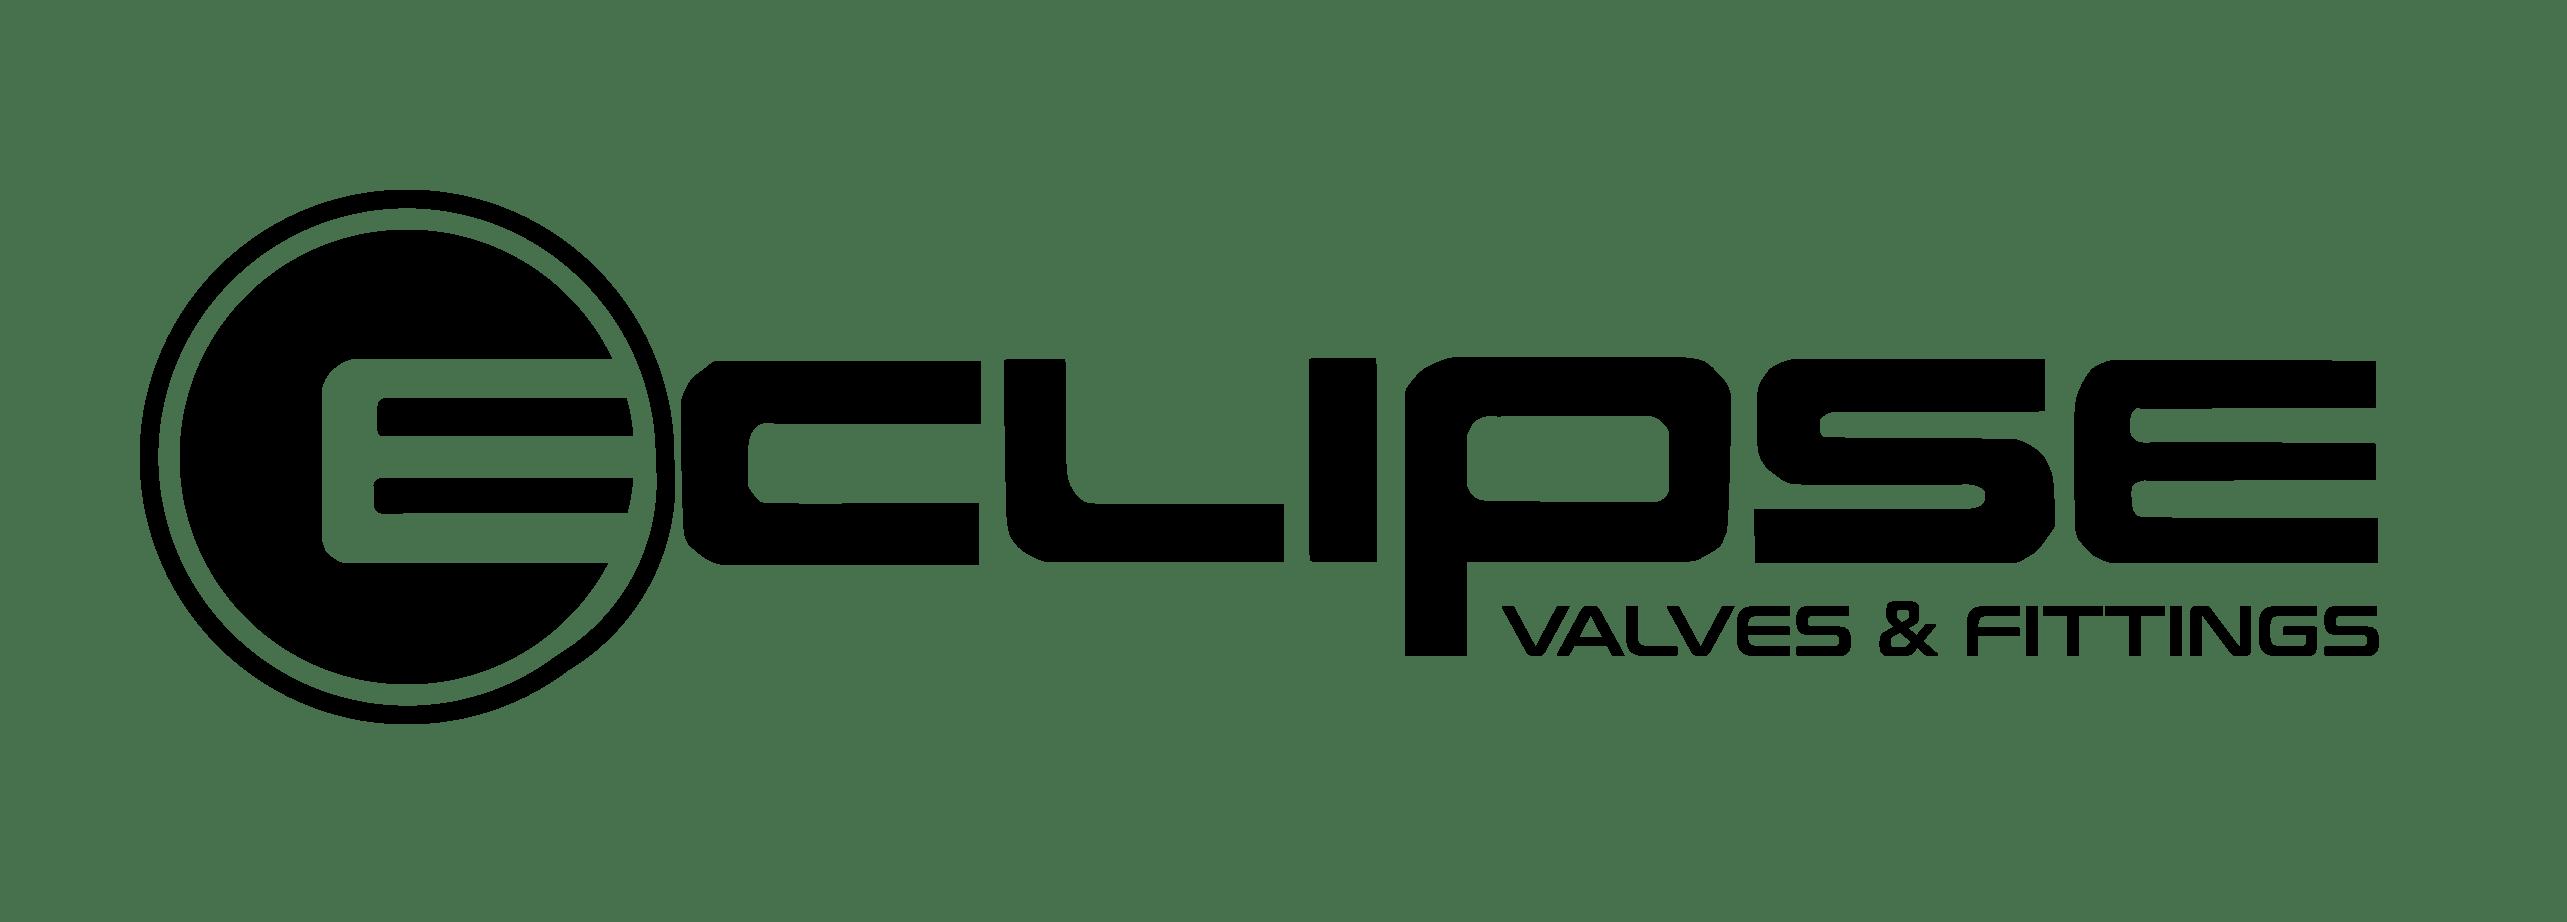 Eclipse Valves Amp Fittings Ltd